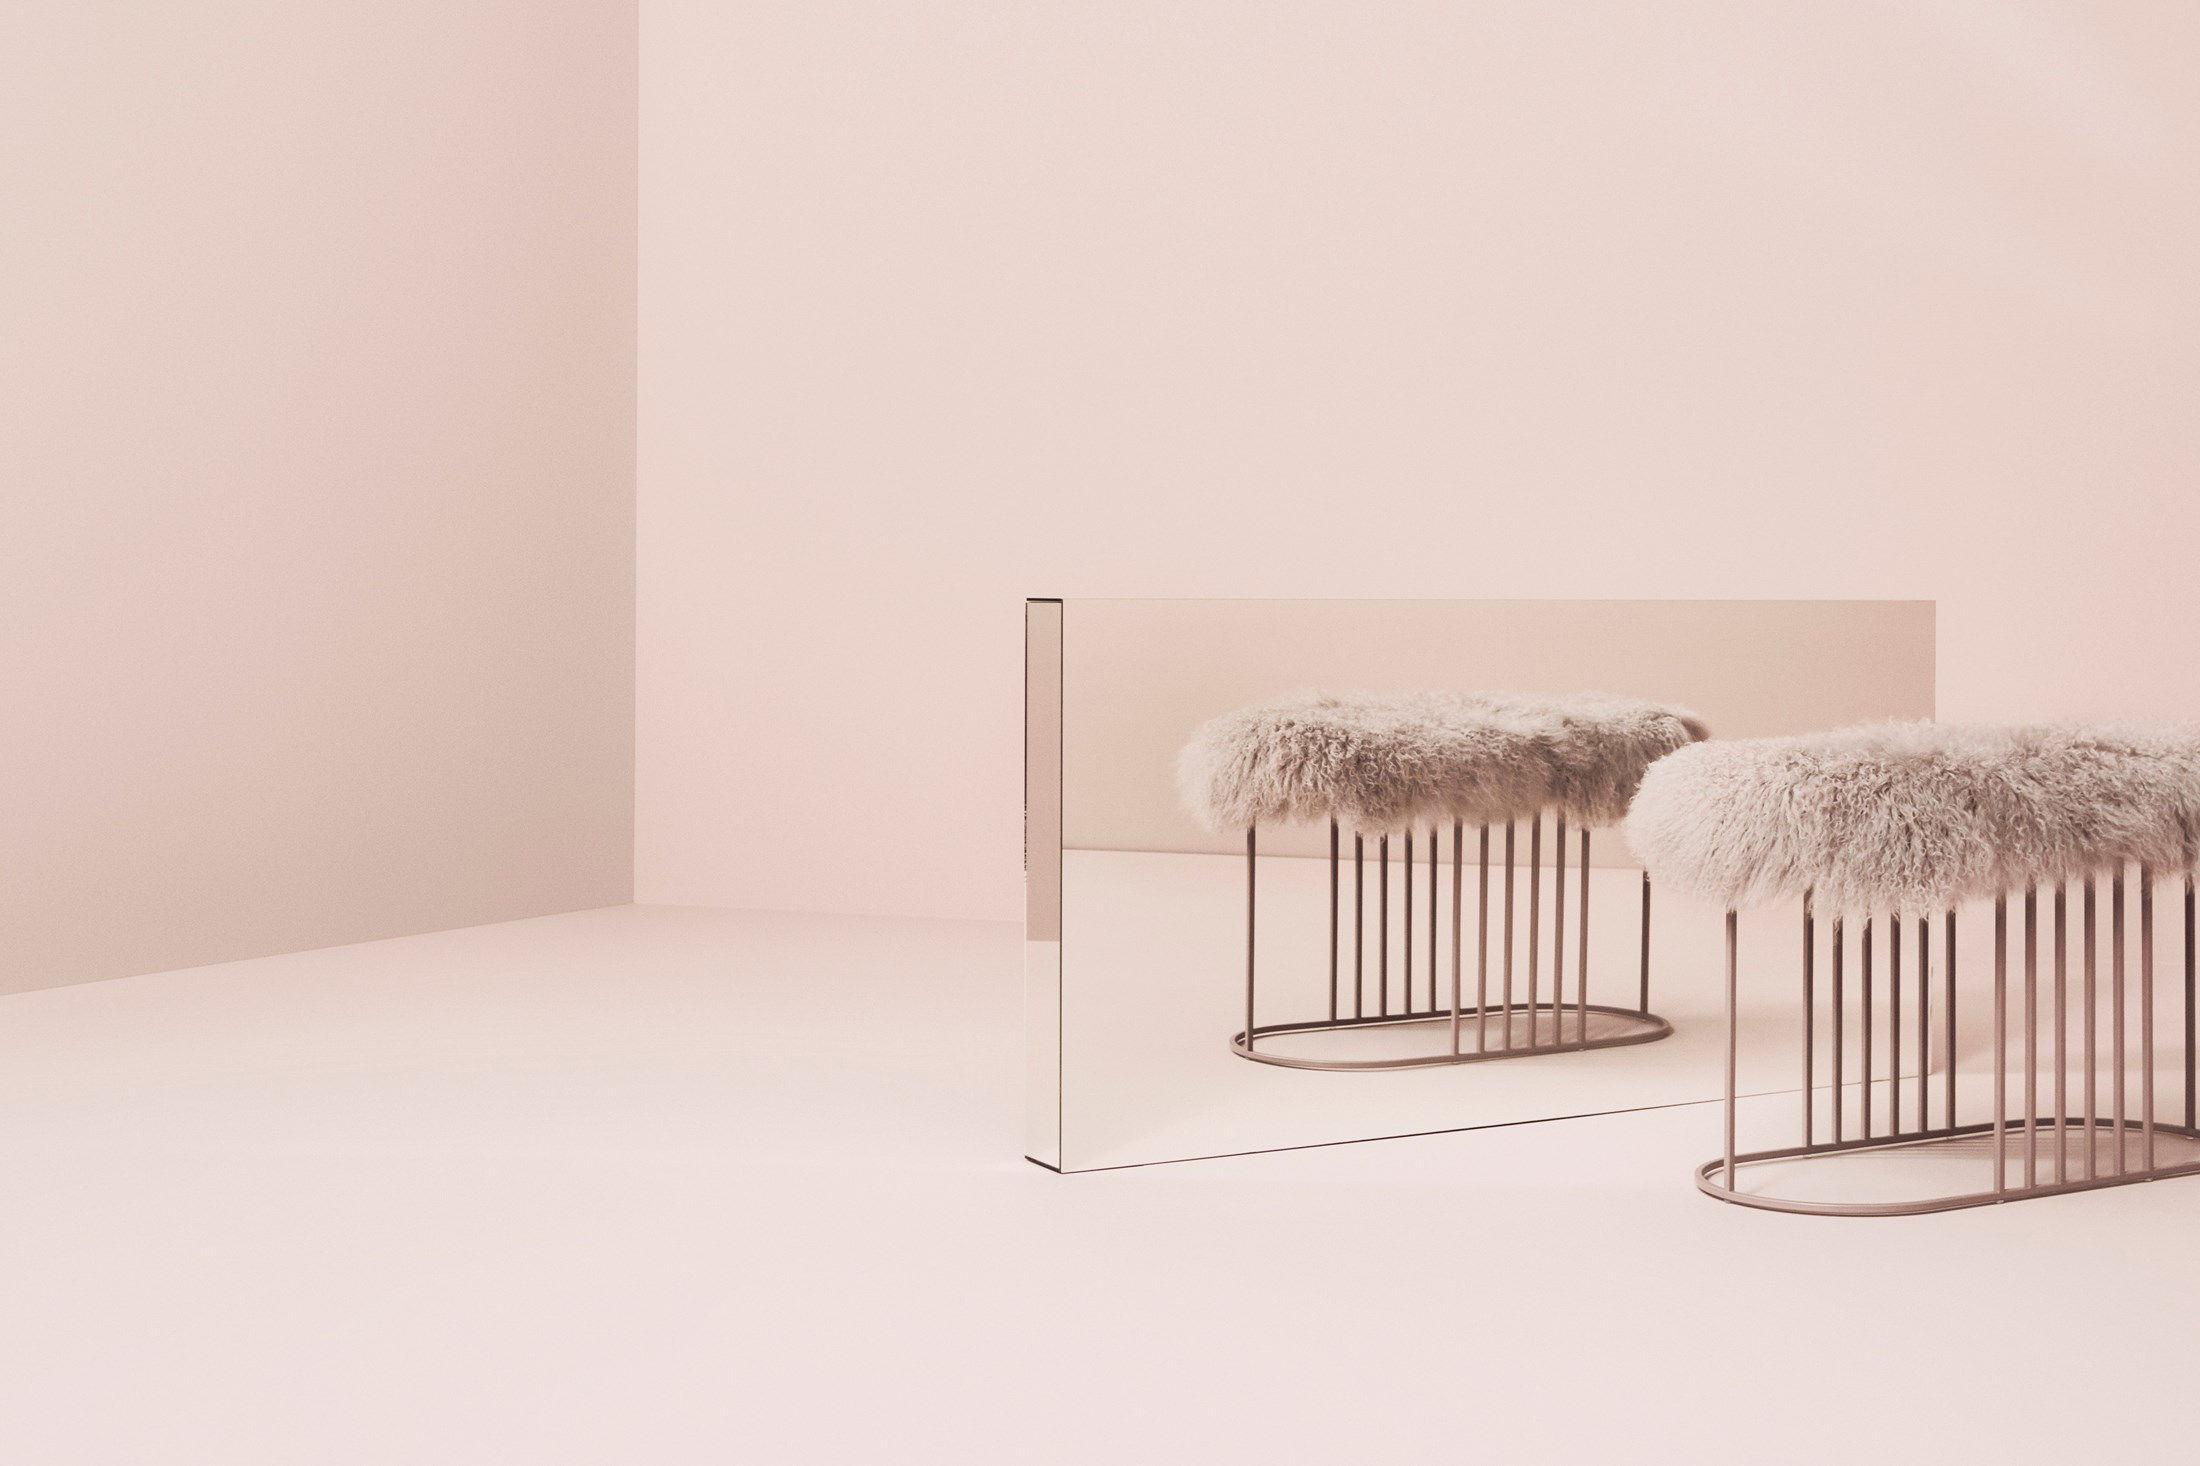 banc rembourr posea furry peau de mouton tib taine l 80 cm rose base rose bolia made. Black Bedroom Furniture Sets. Home Design Ideas